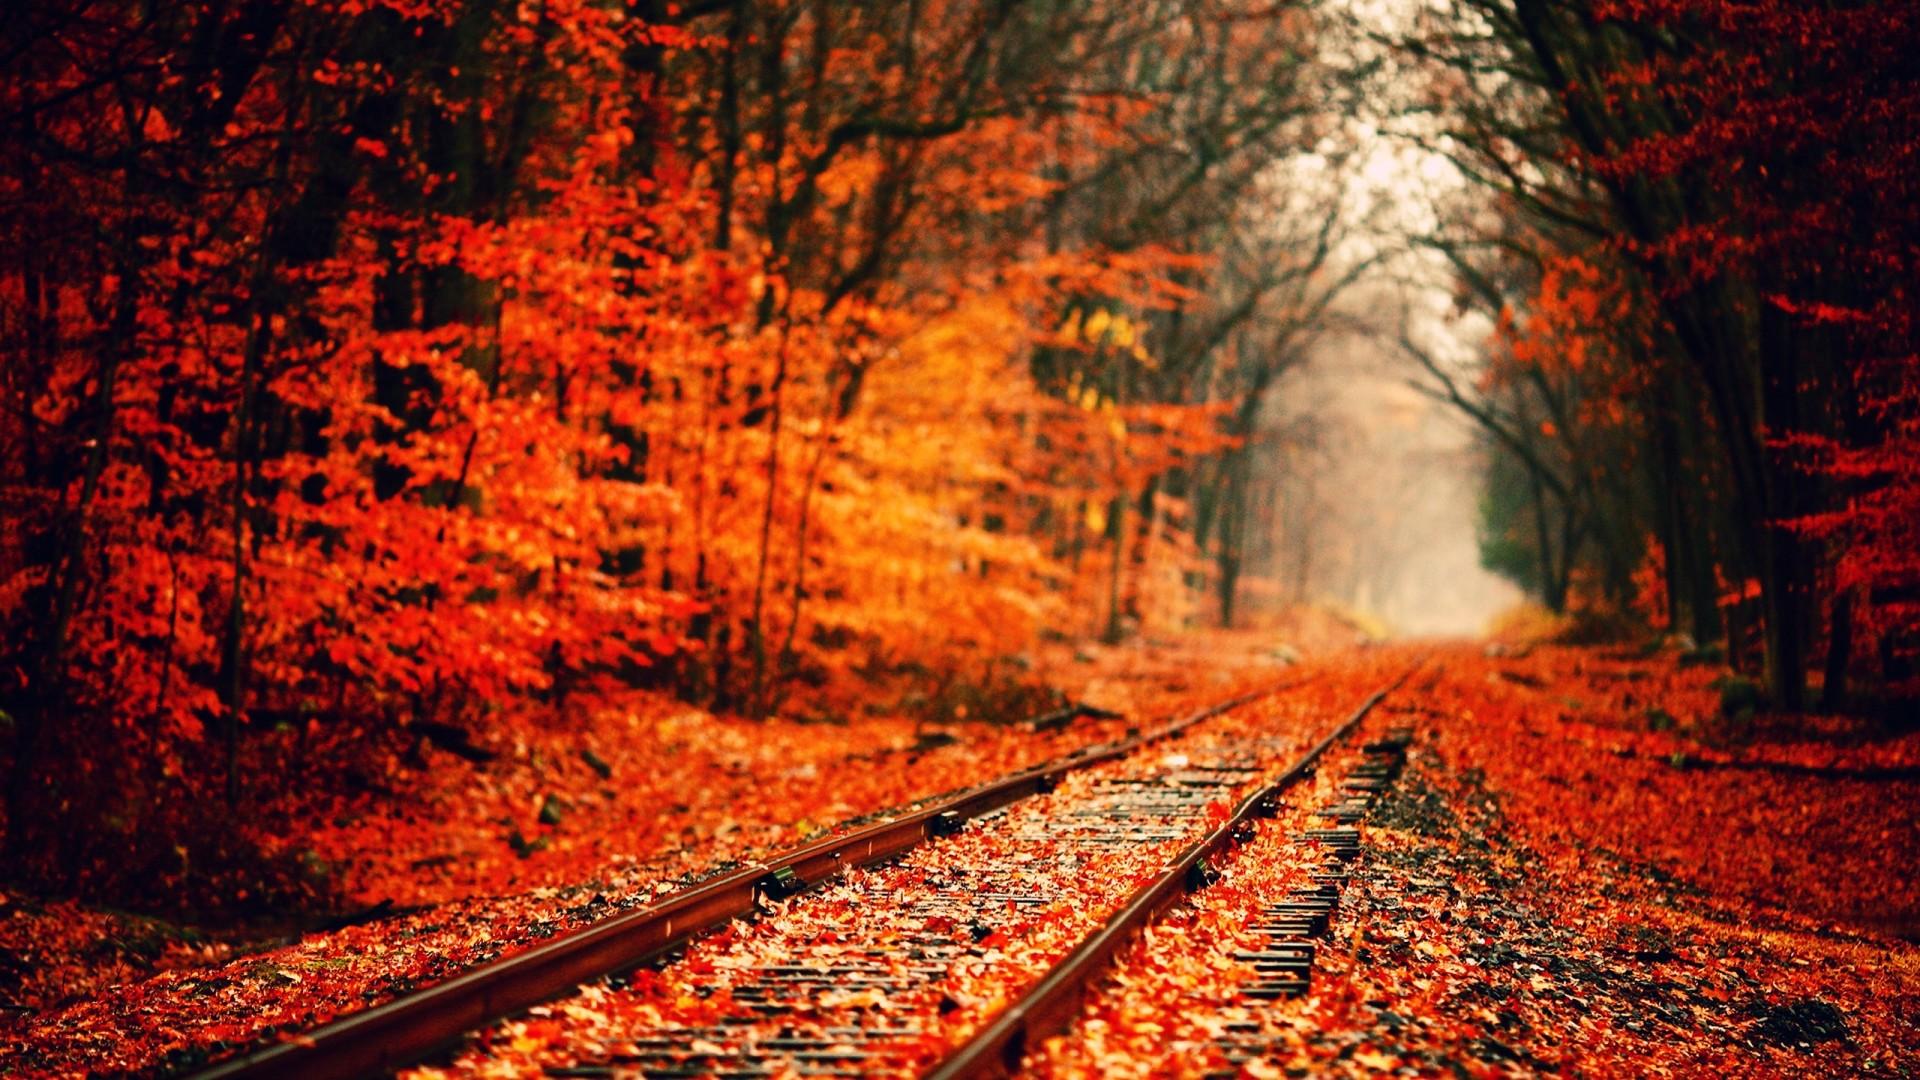 Fall Season Wallpaper | Desktop Image